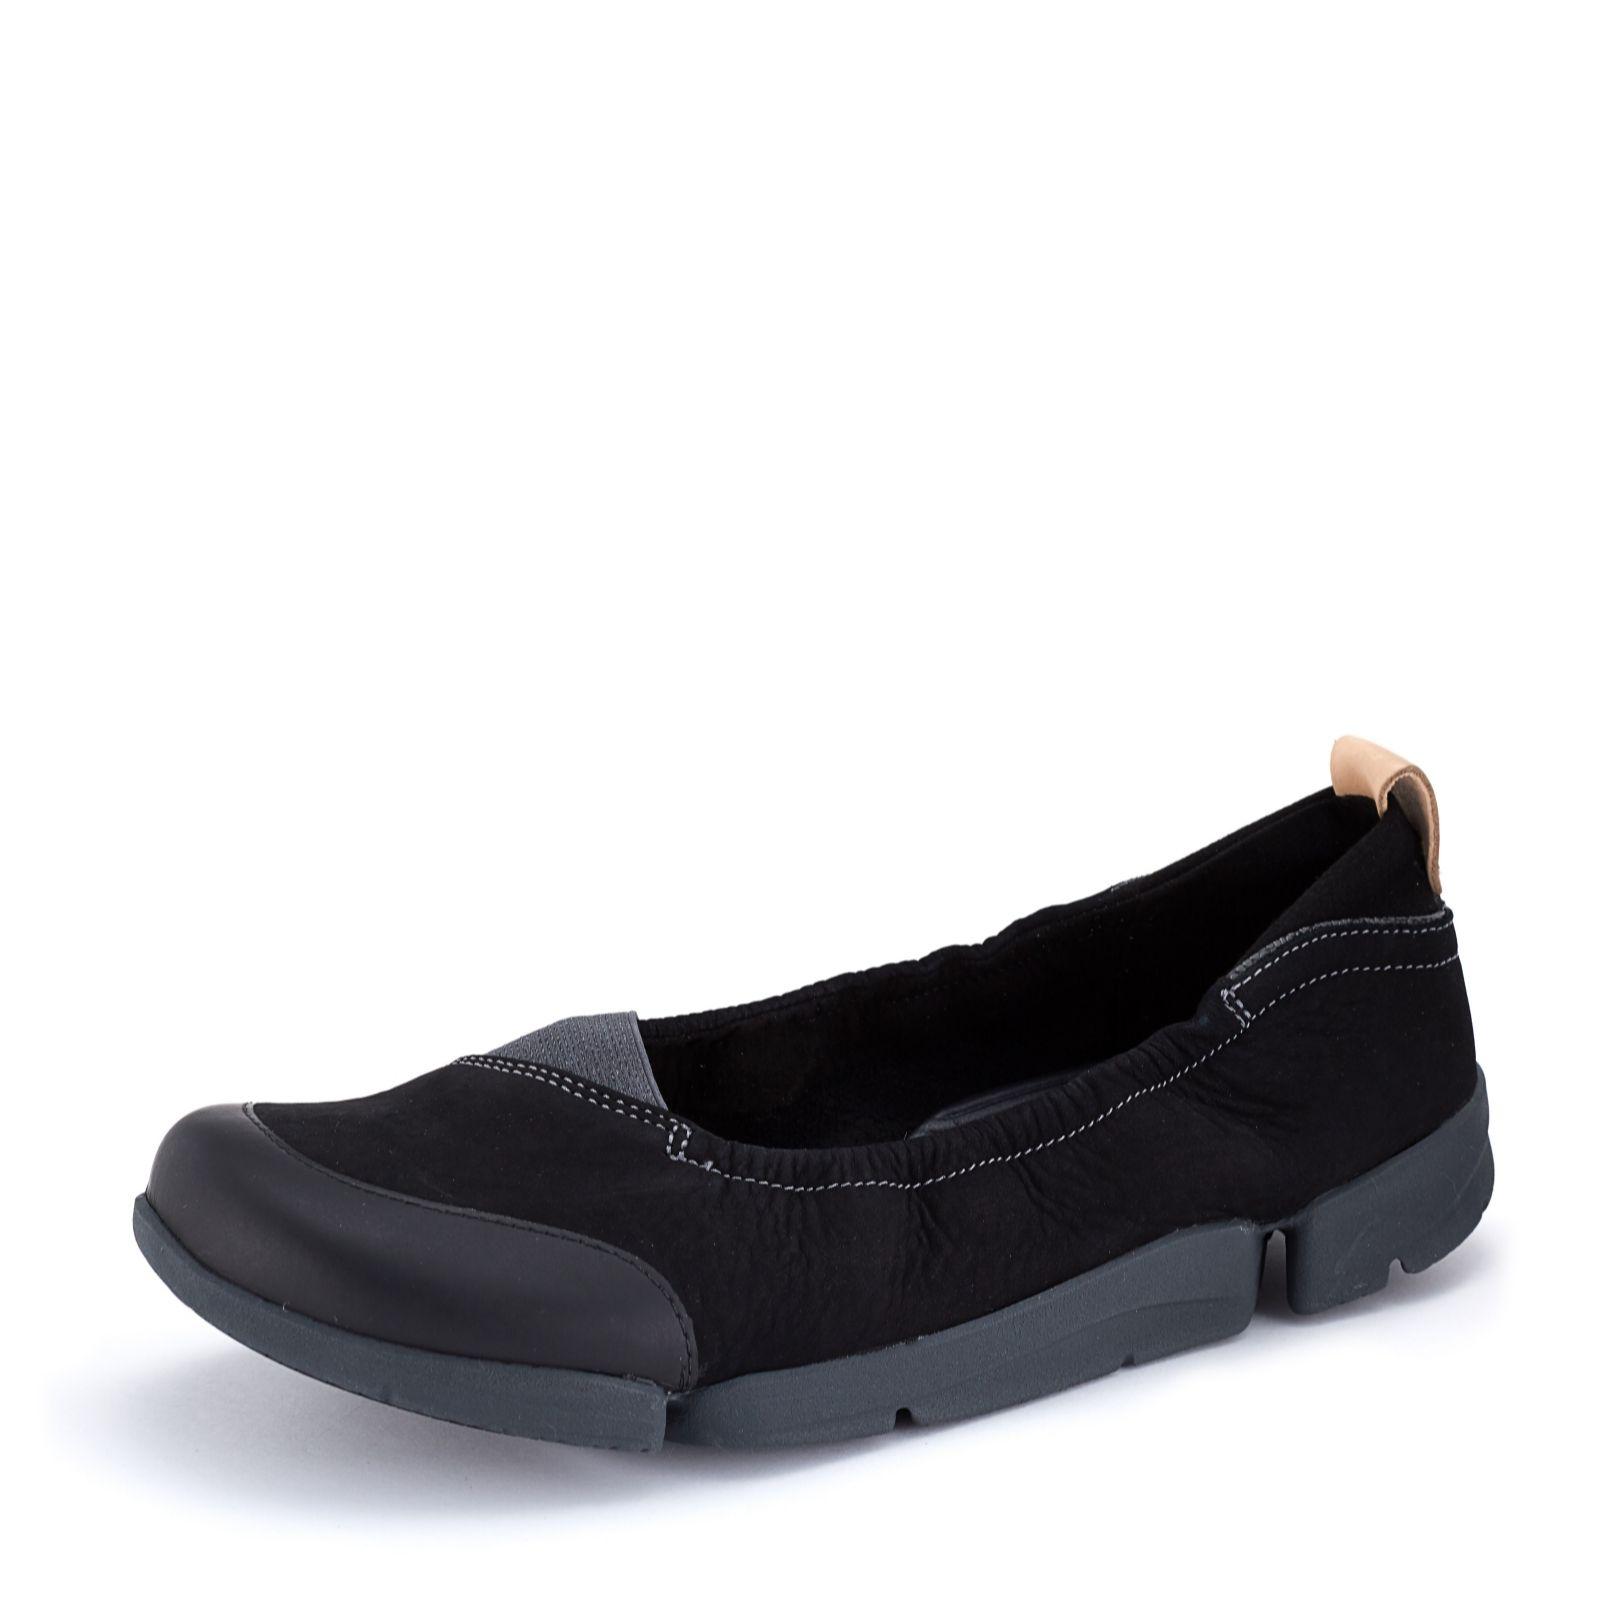 a4e0bee34d Clarks Tri Adapt Ballerina Shoe Standard Fit - QVC UK